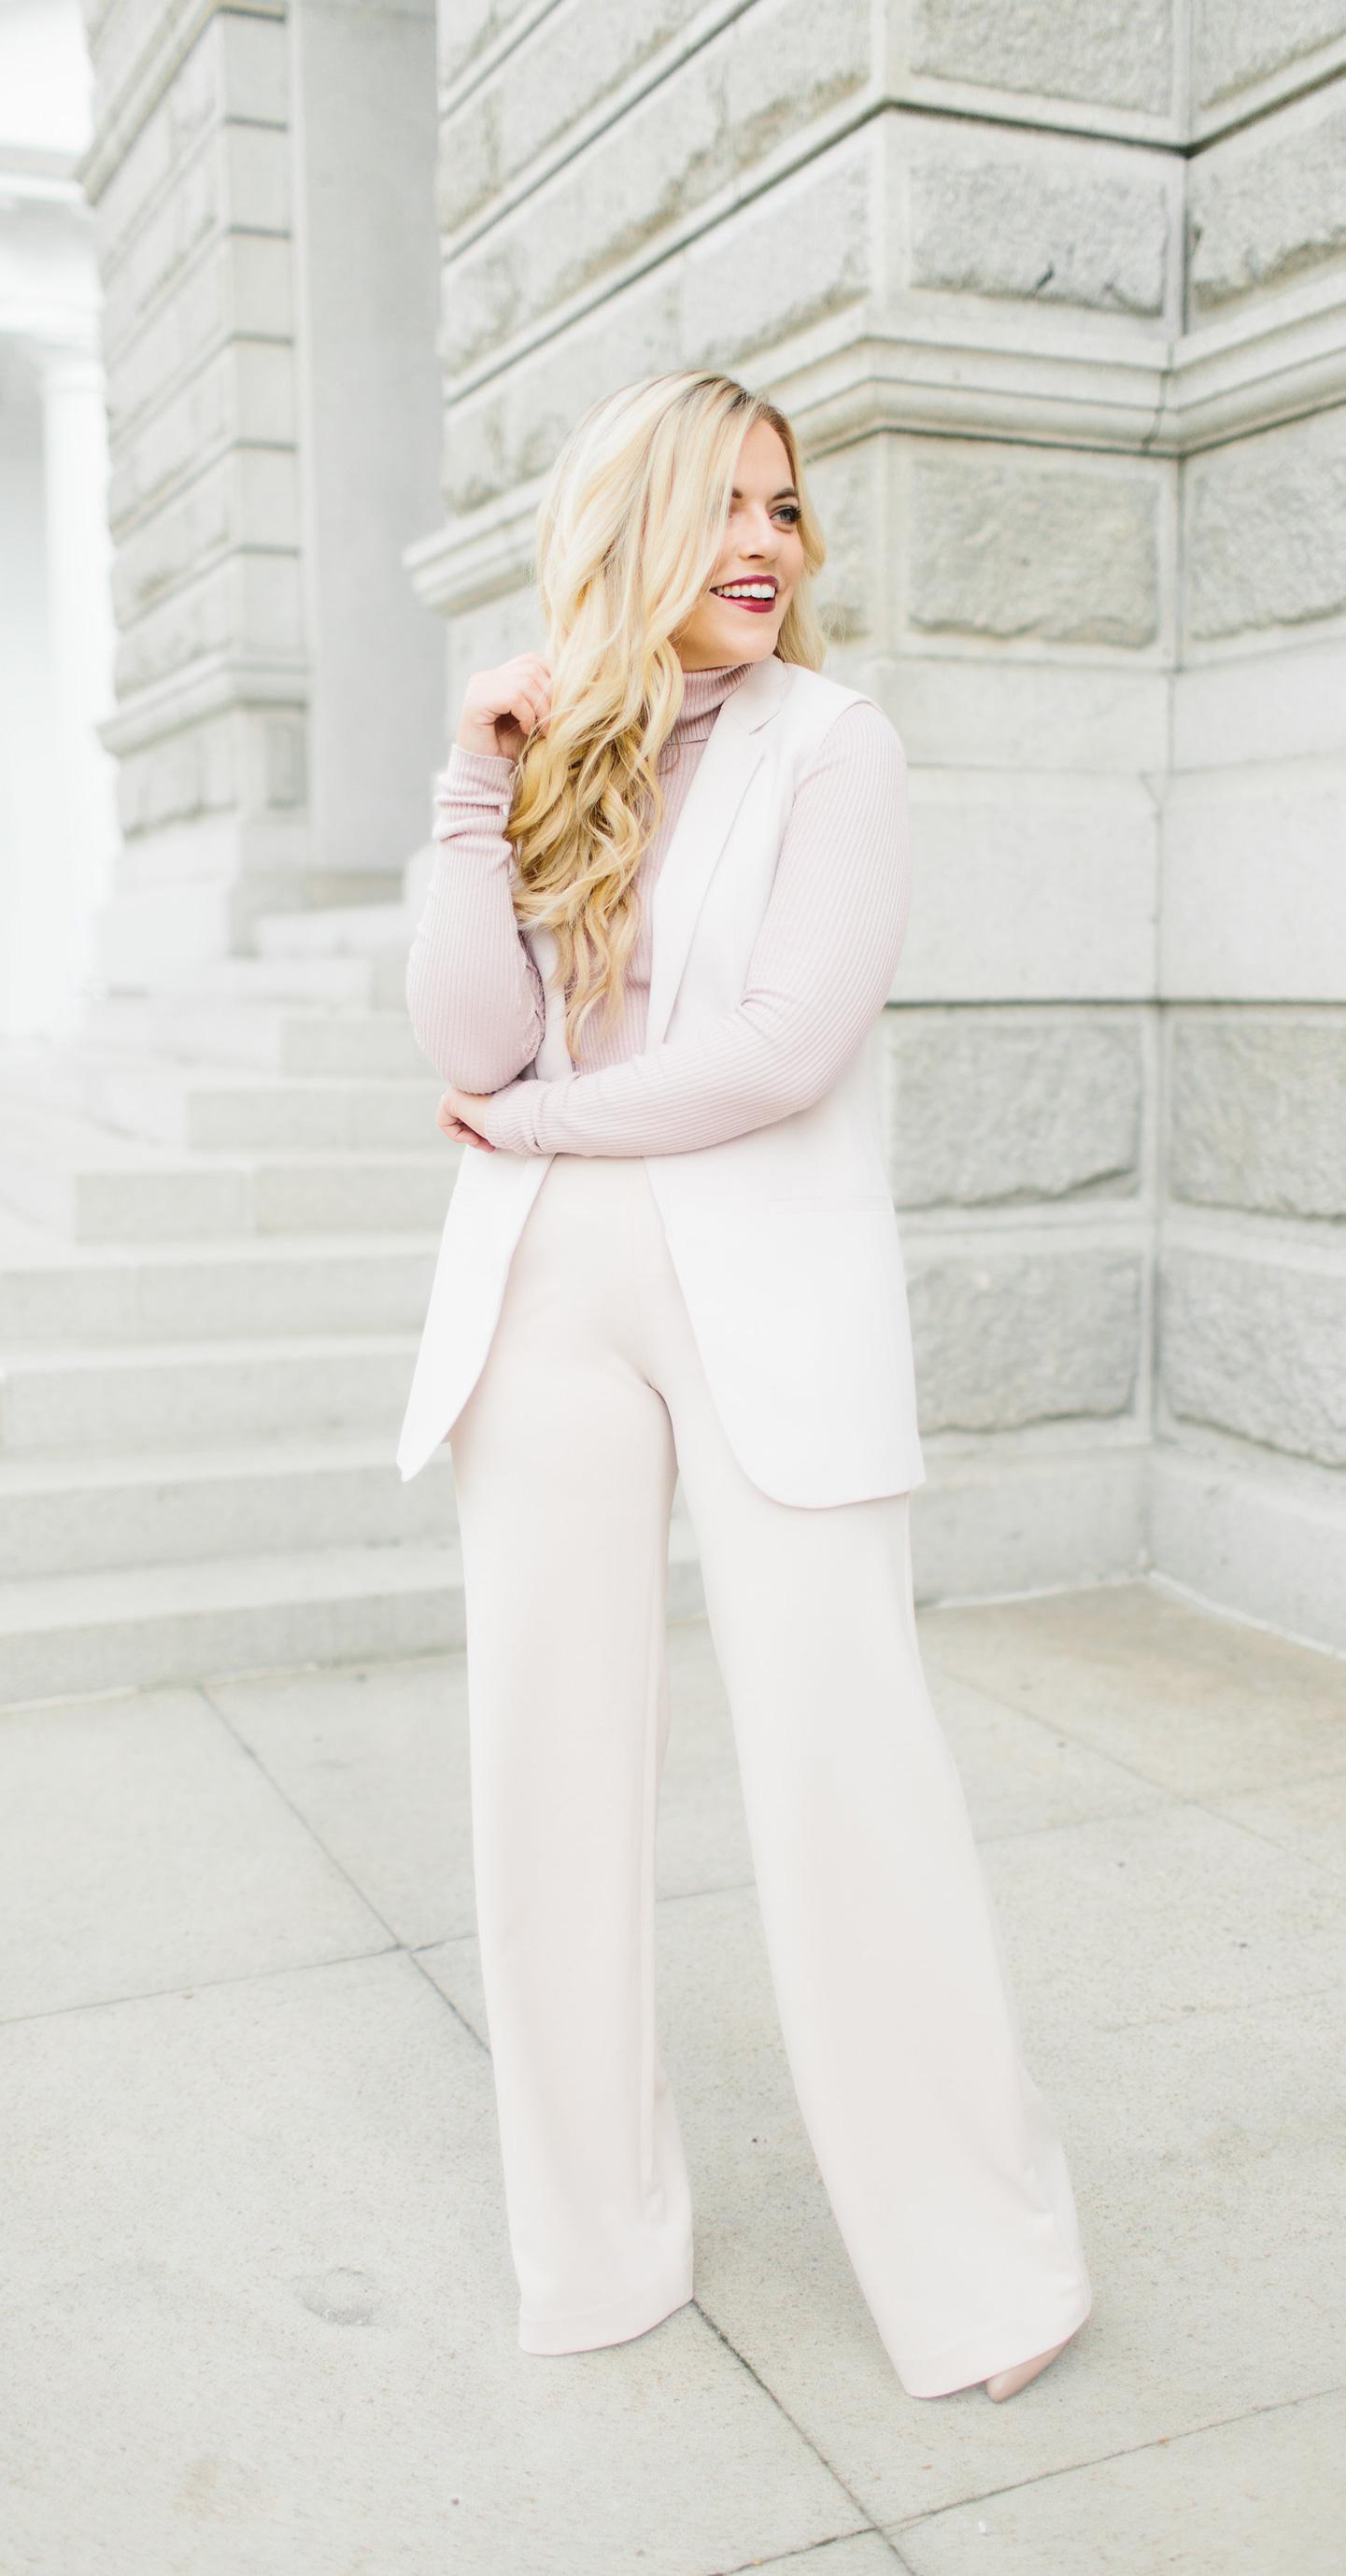 Blush Pink Suit